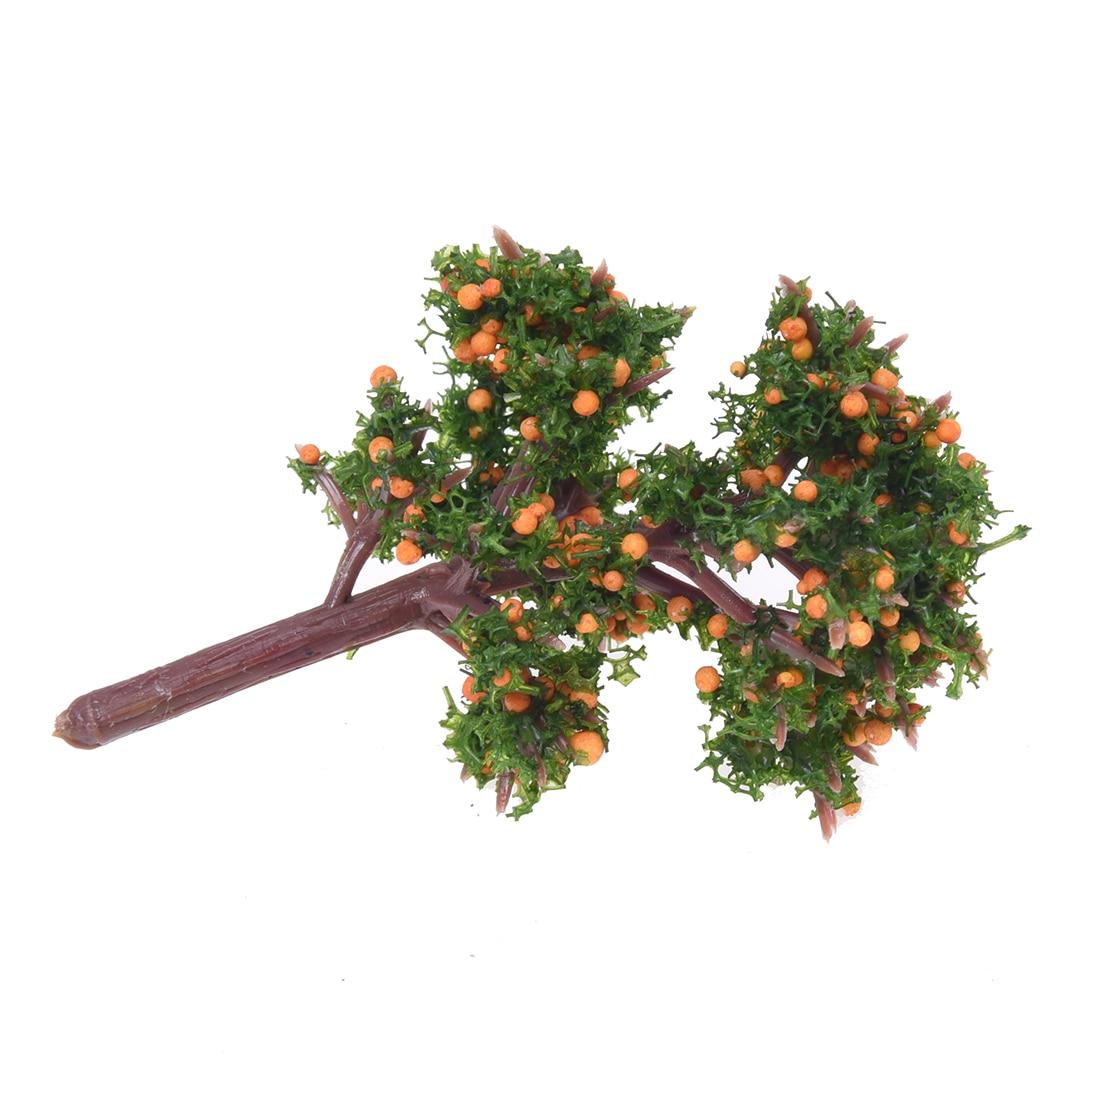 Miniature Emulation Orange Tree Moss Bonsai Mini Landscape DIY Craft Garden Ornament